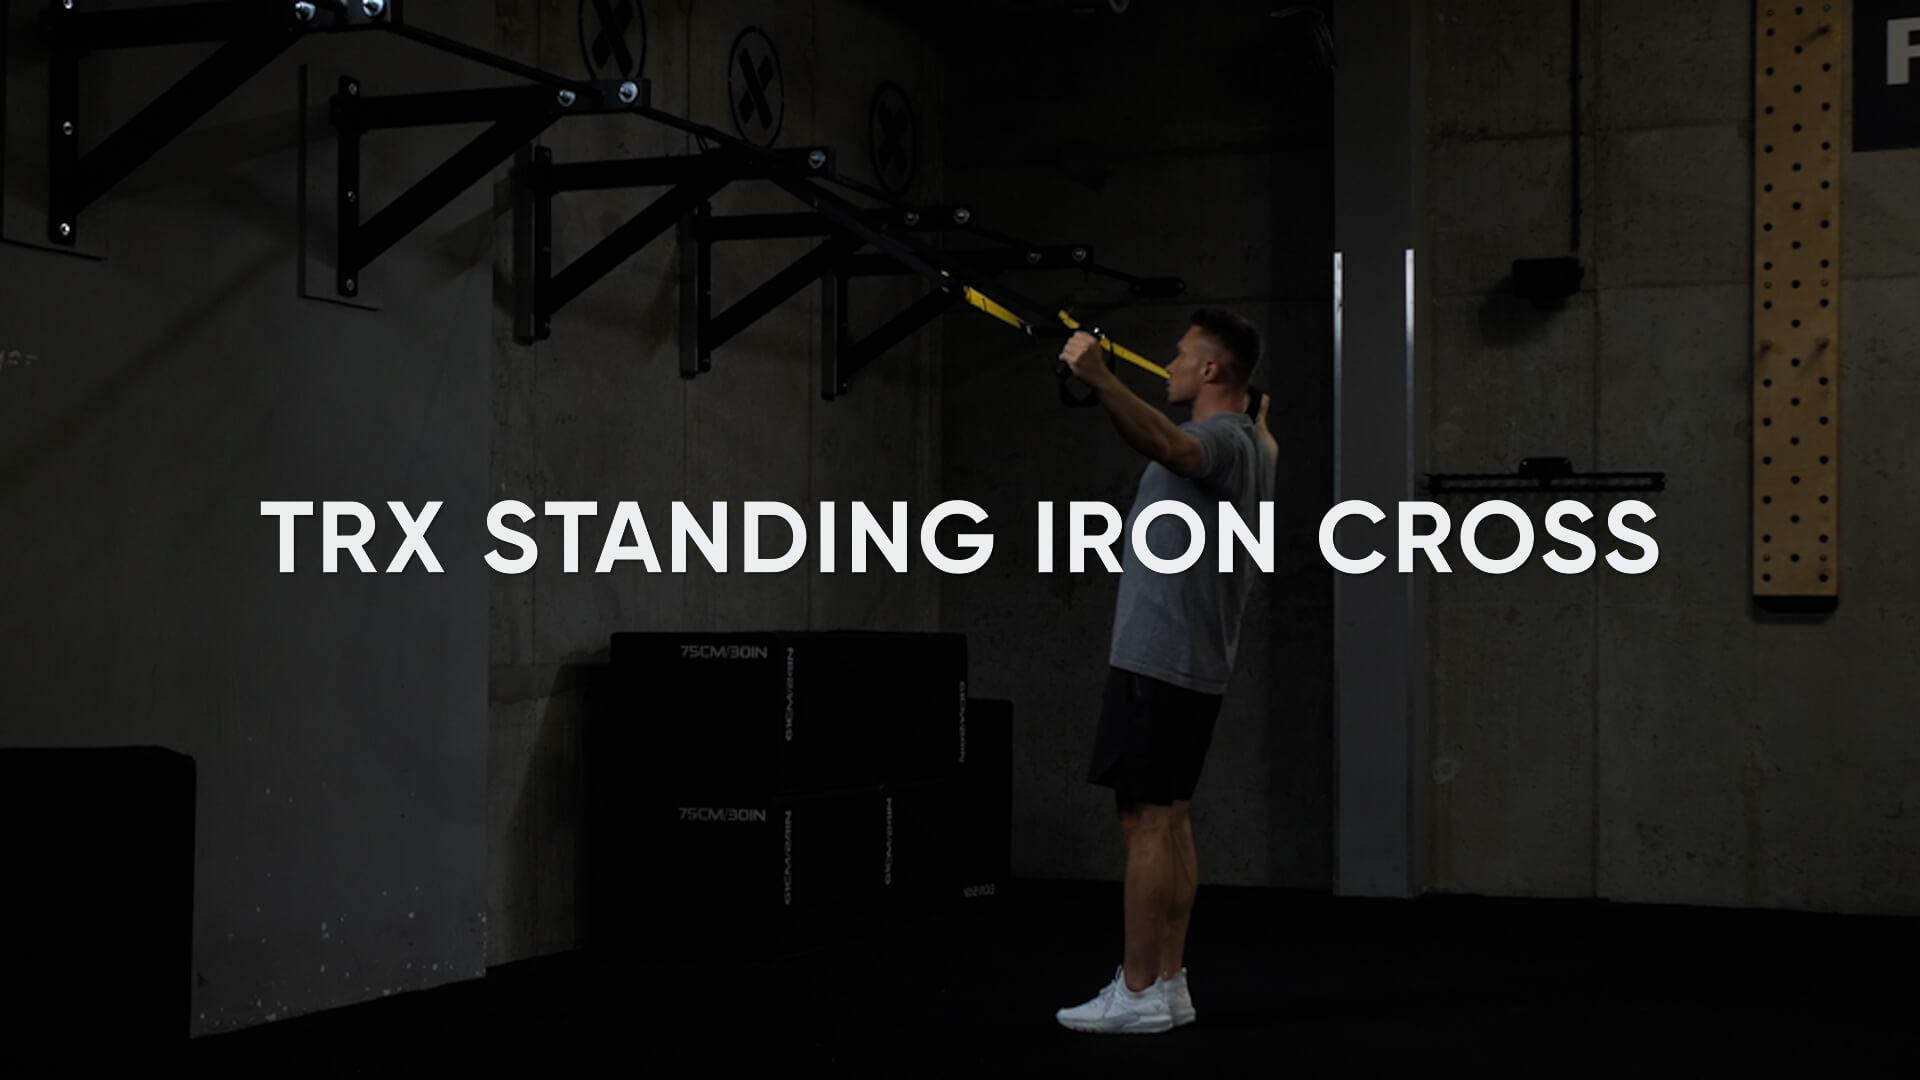 TRX Standing Iron Cross